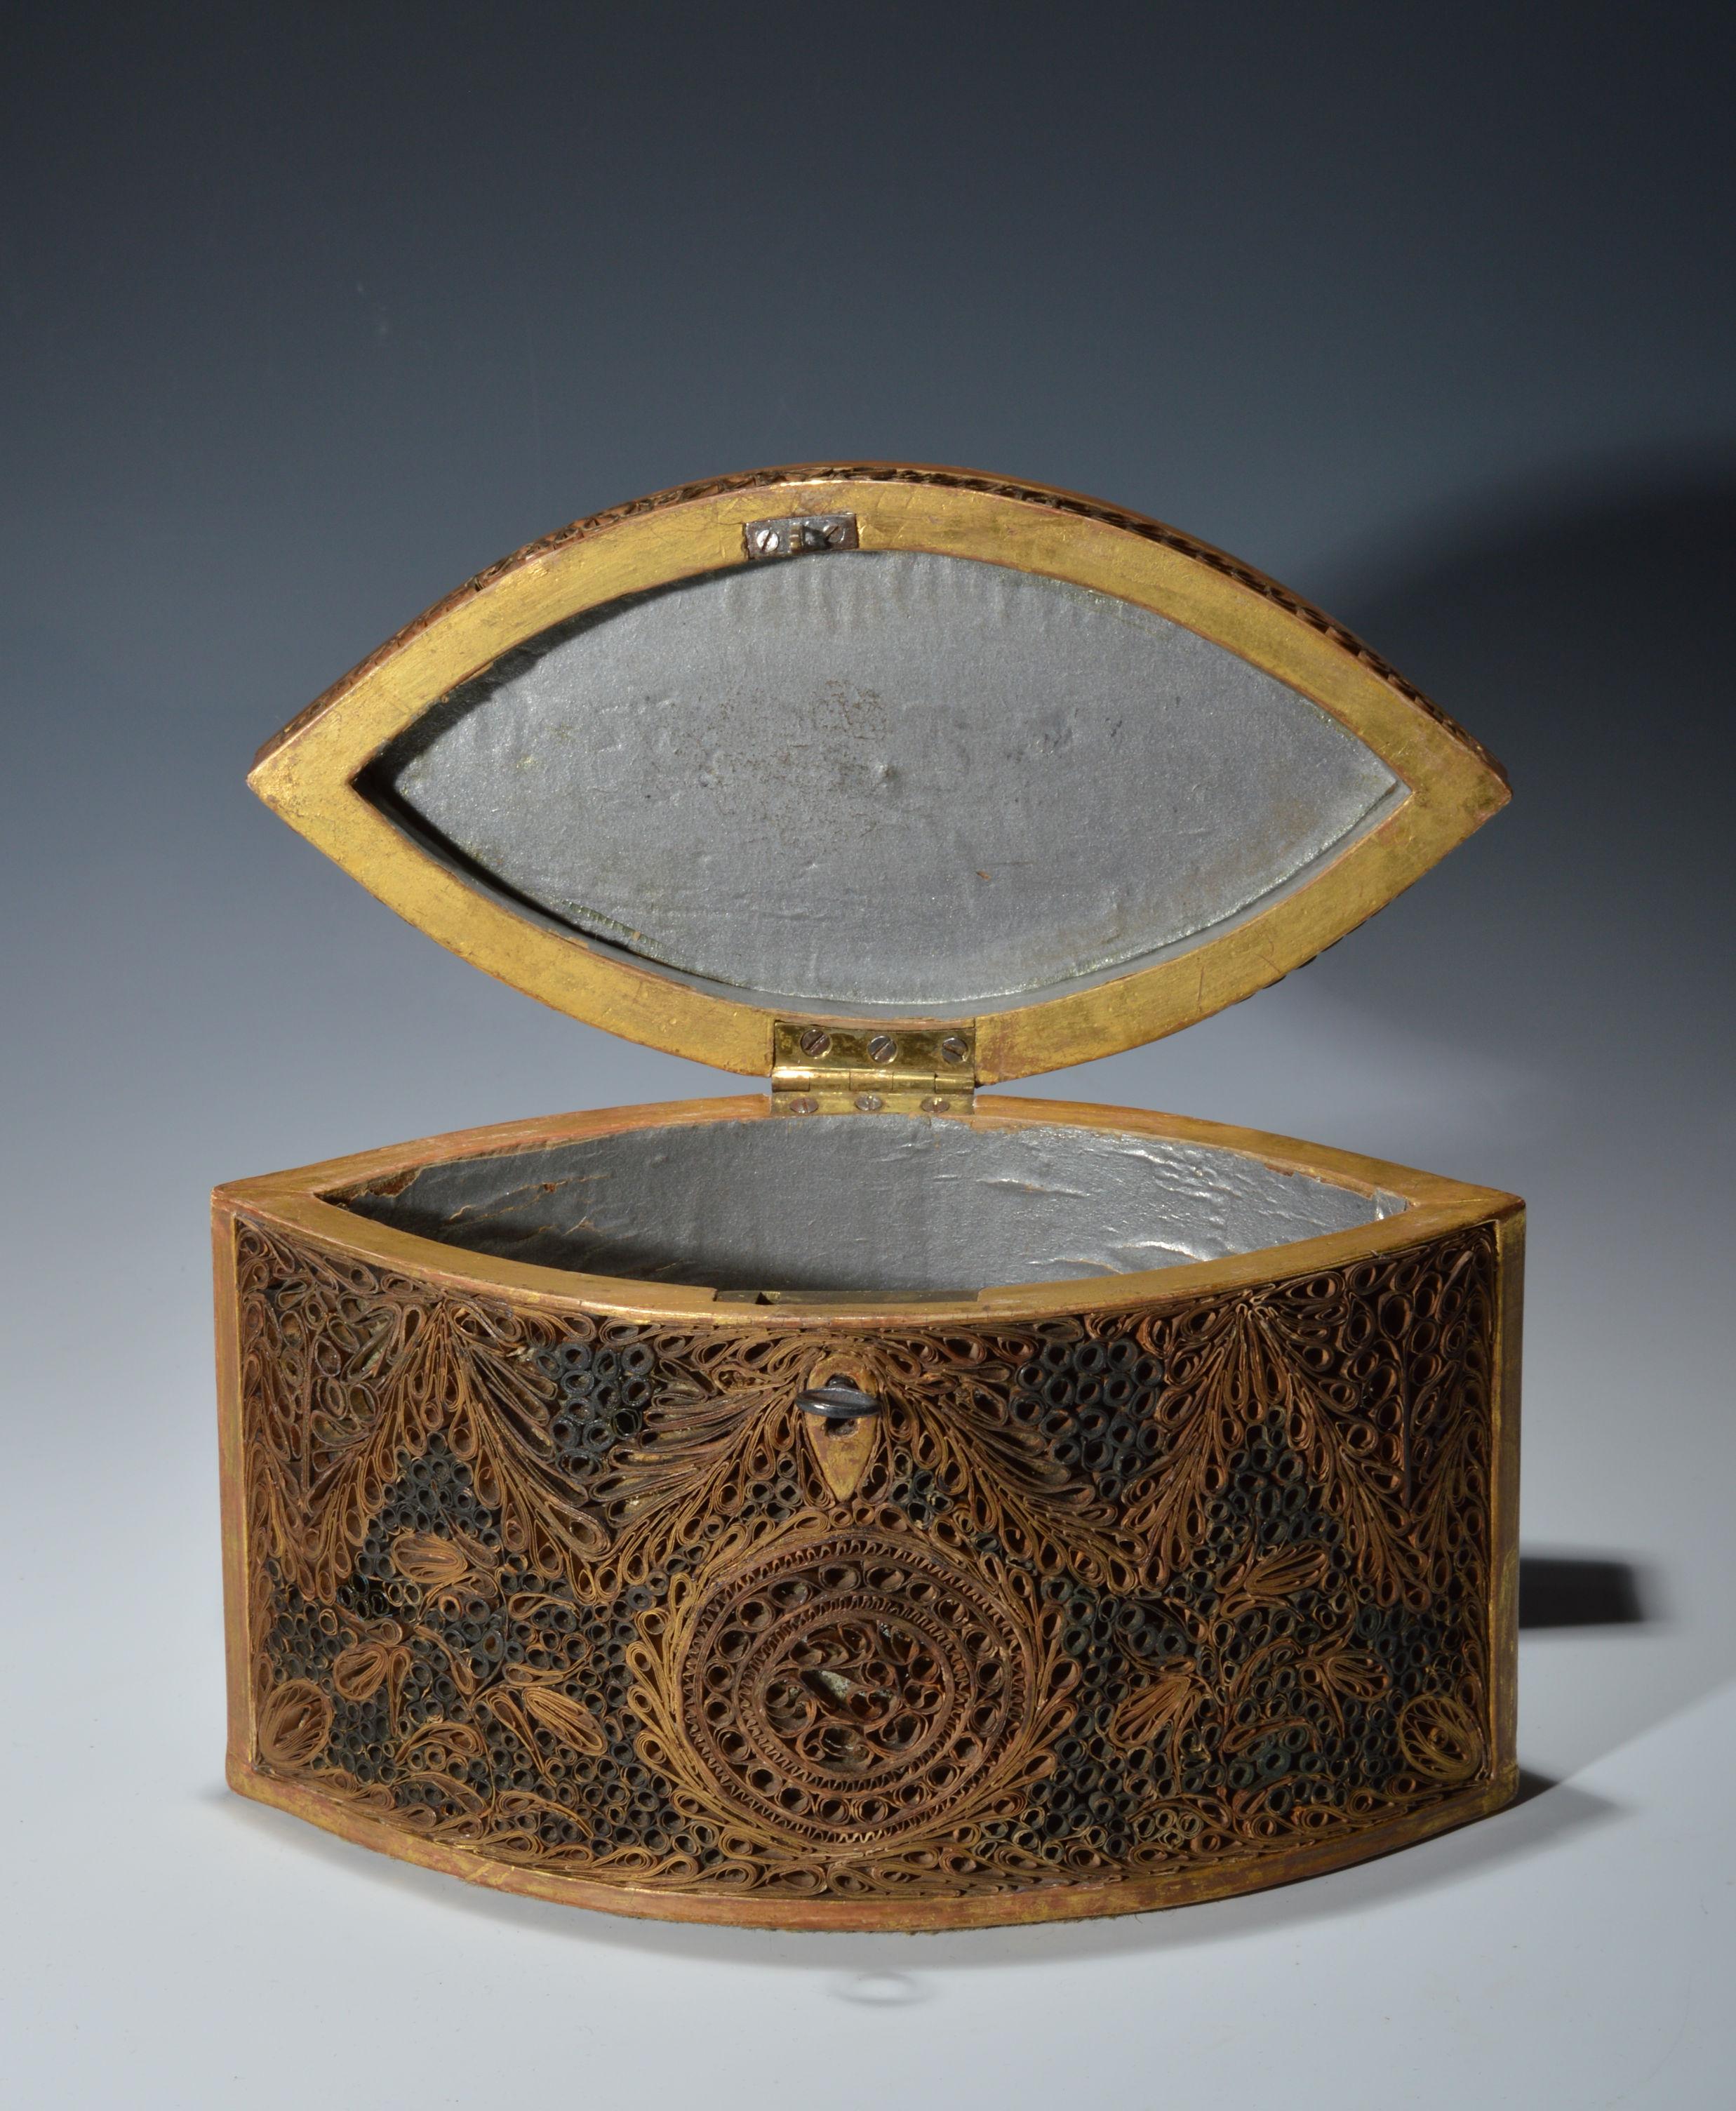 Antique Scroll Paper: ANTIQUE 18TH CENTURY PAPER SCROLL TEA CADDY